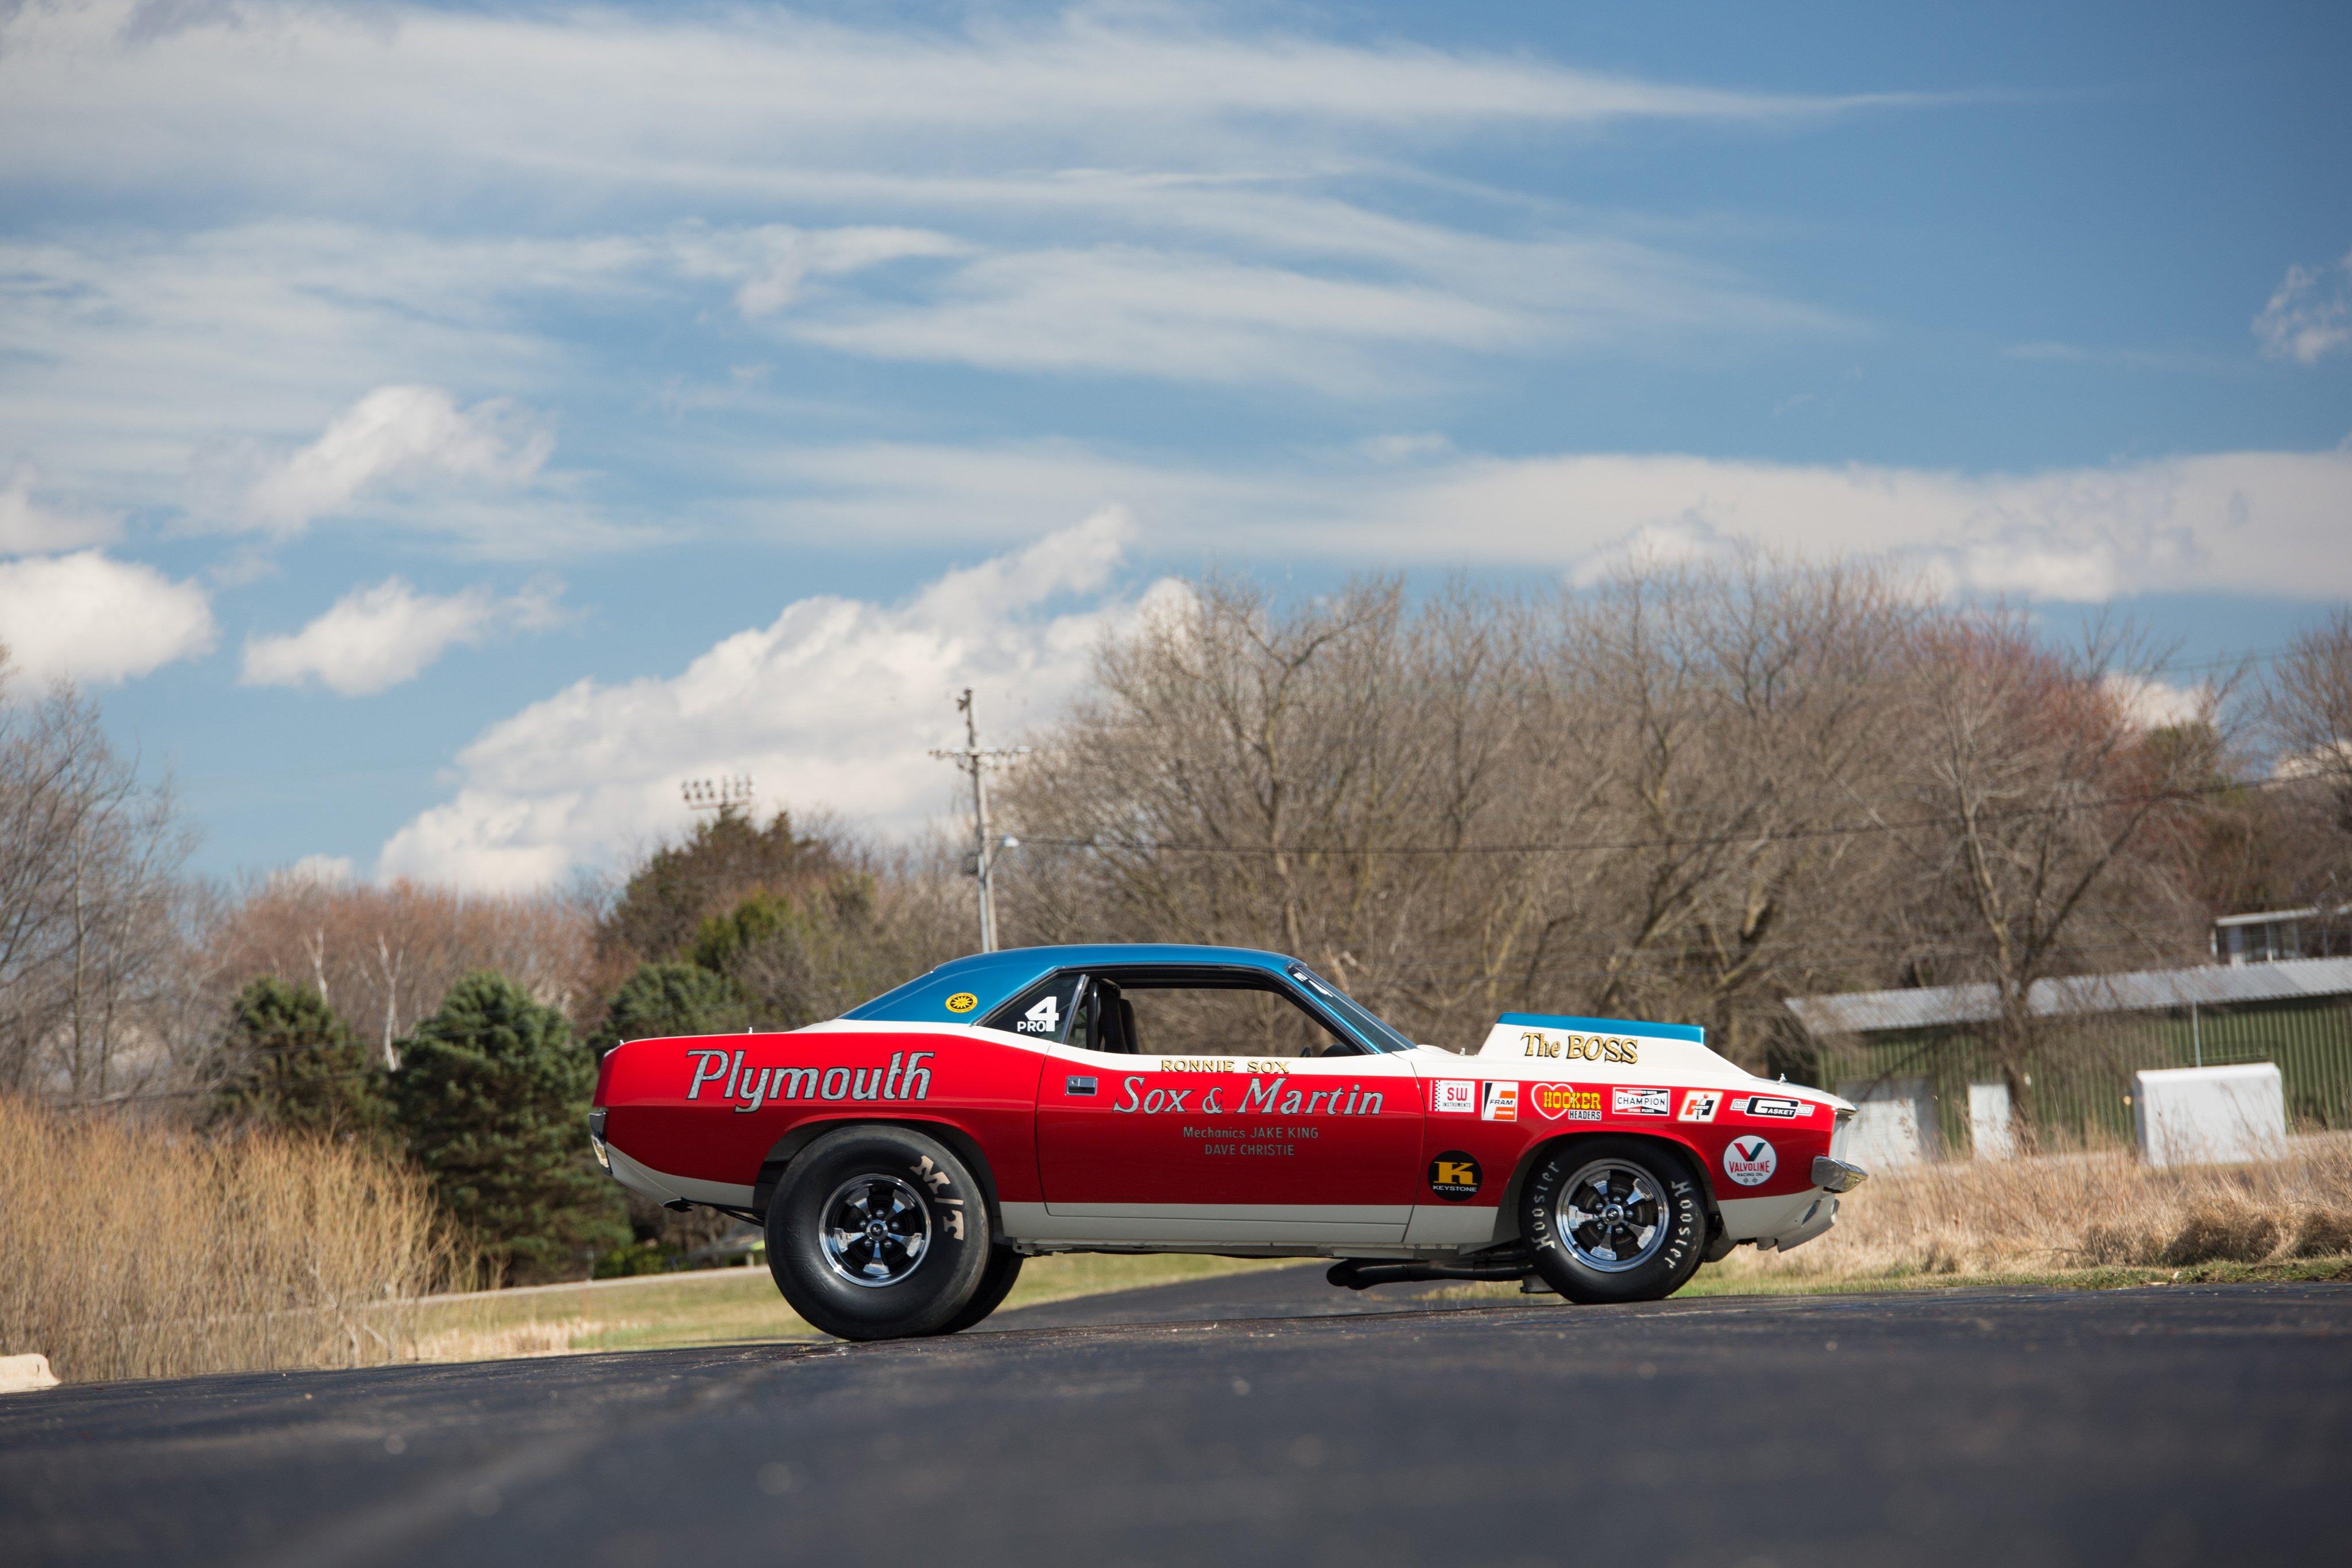 1971 Plymouth Hemi Cuda Sox Martin Nhra Drag Race Racing